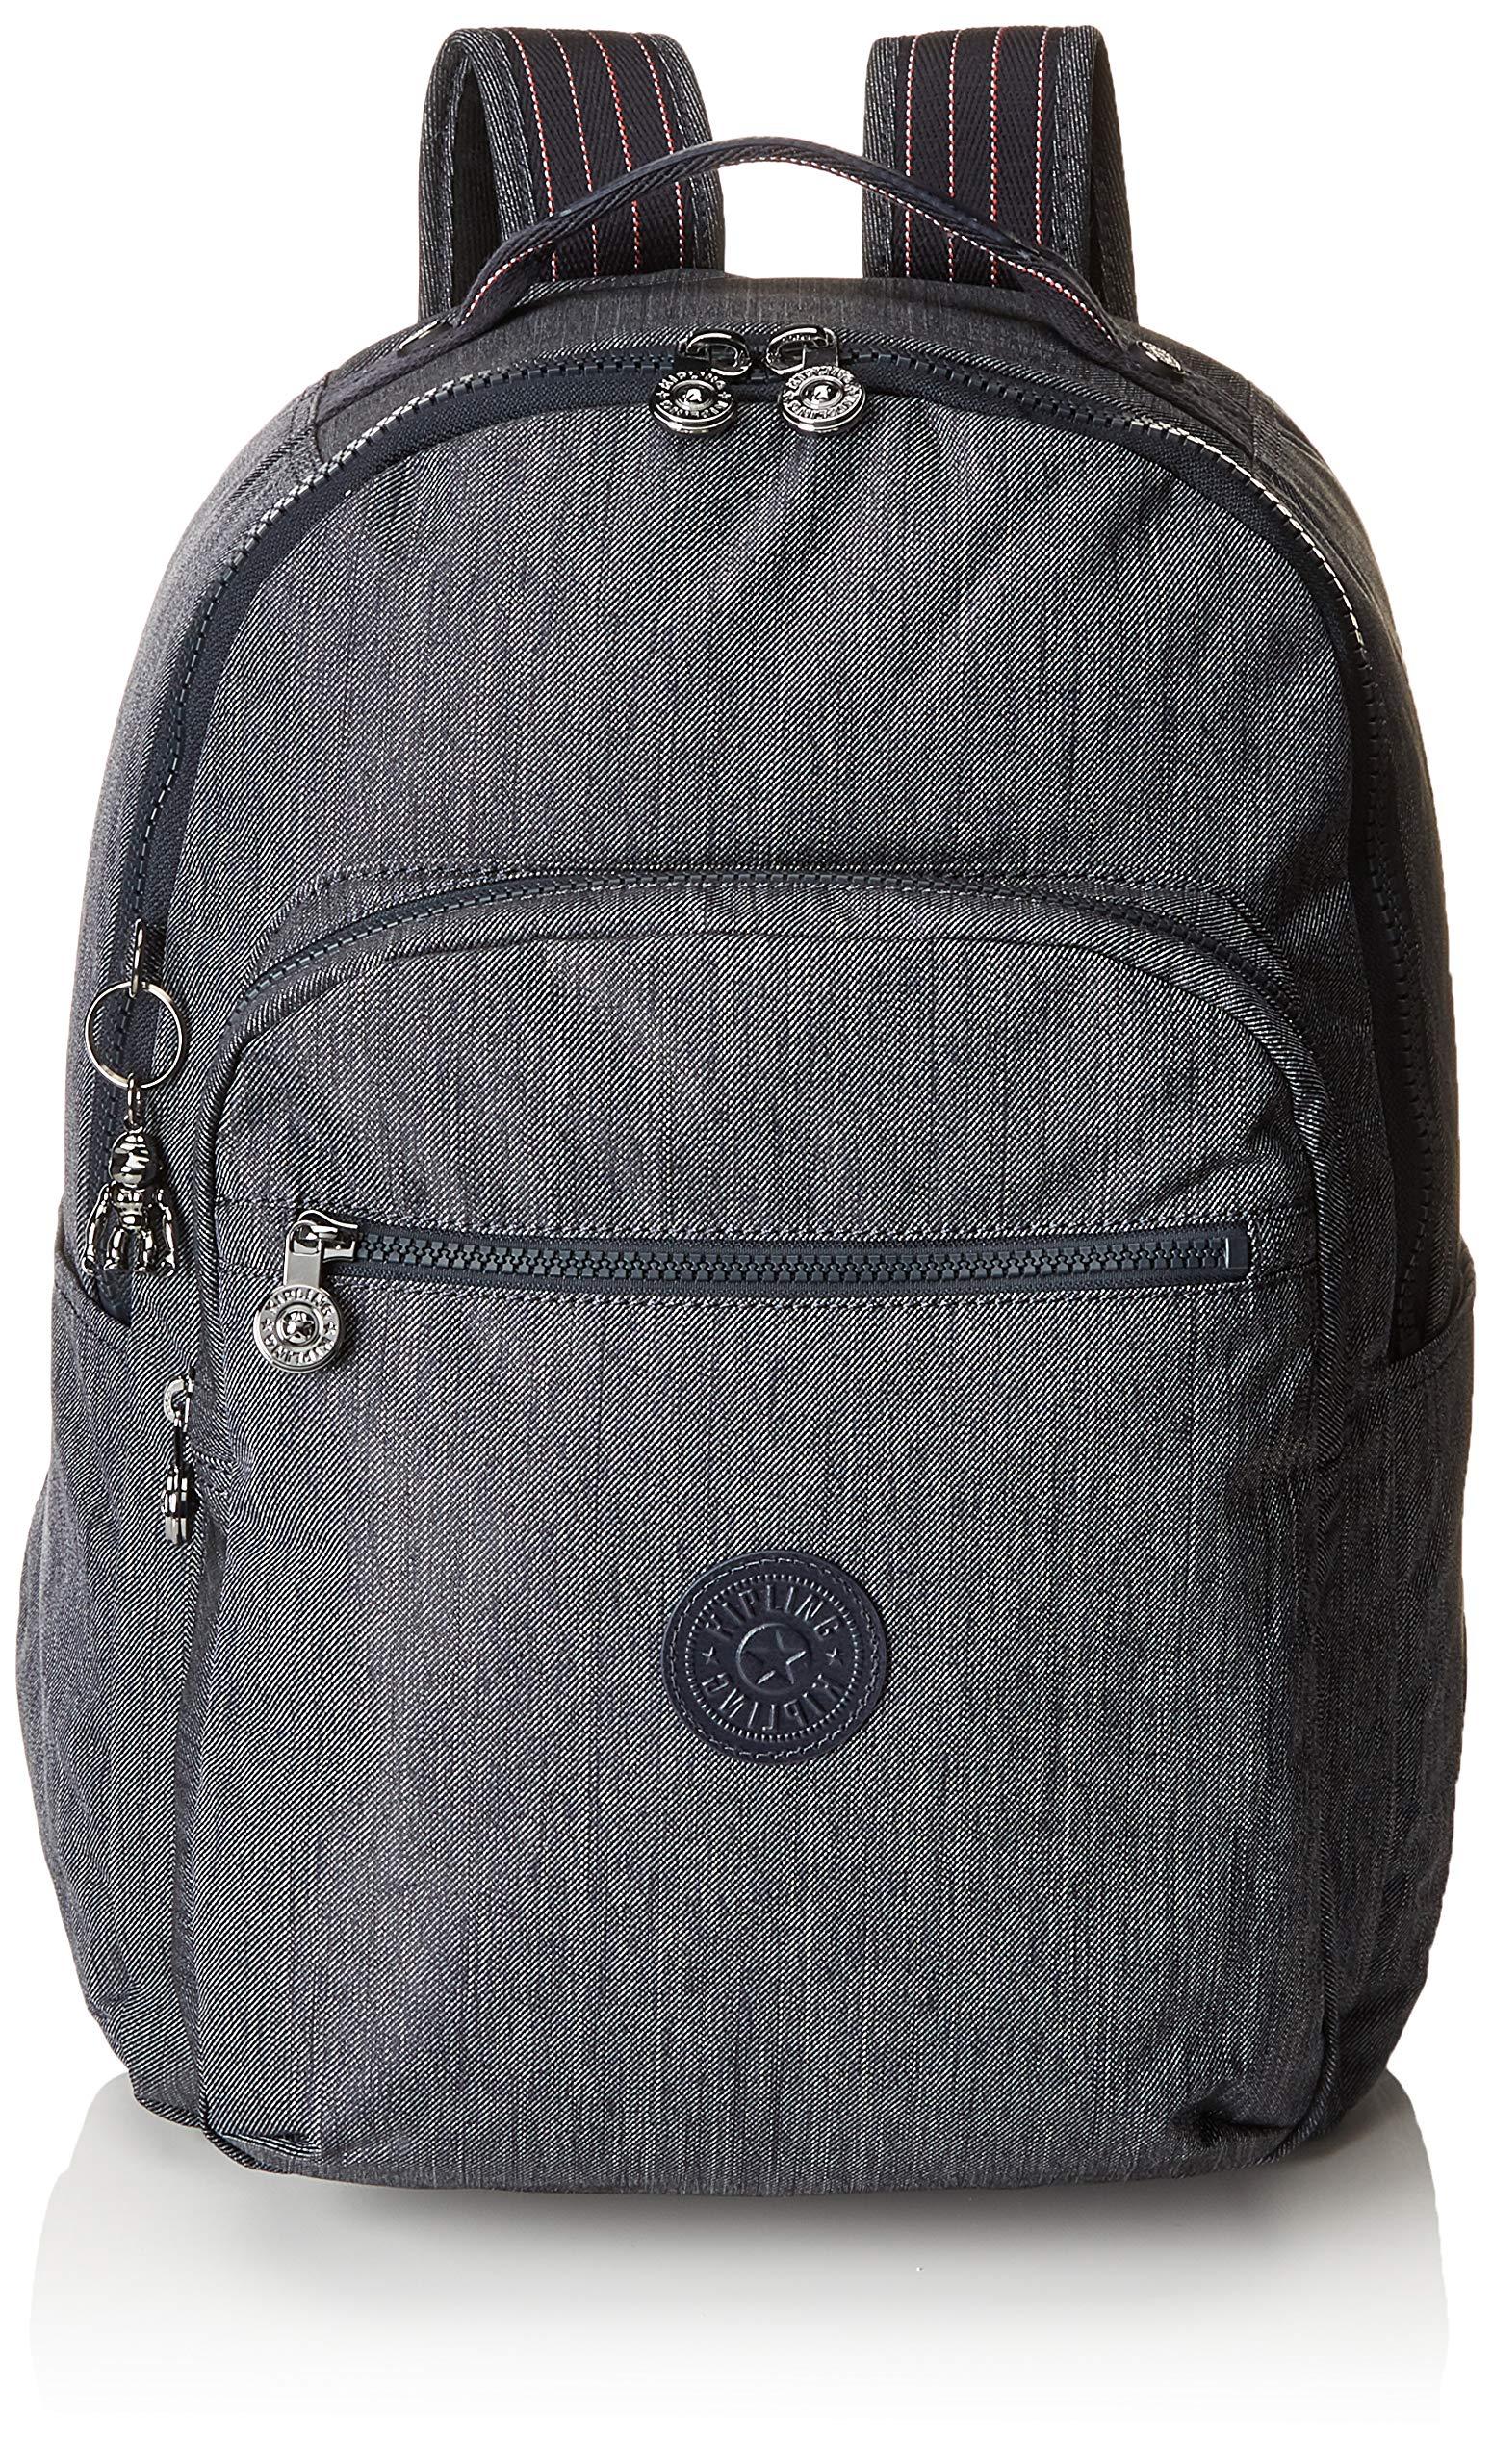 Kipling SEOUL BABY BACKPACK Bag Organiser, 44 cm, 26 liters, Blue (Active Denim)